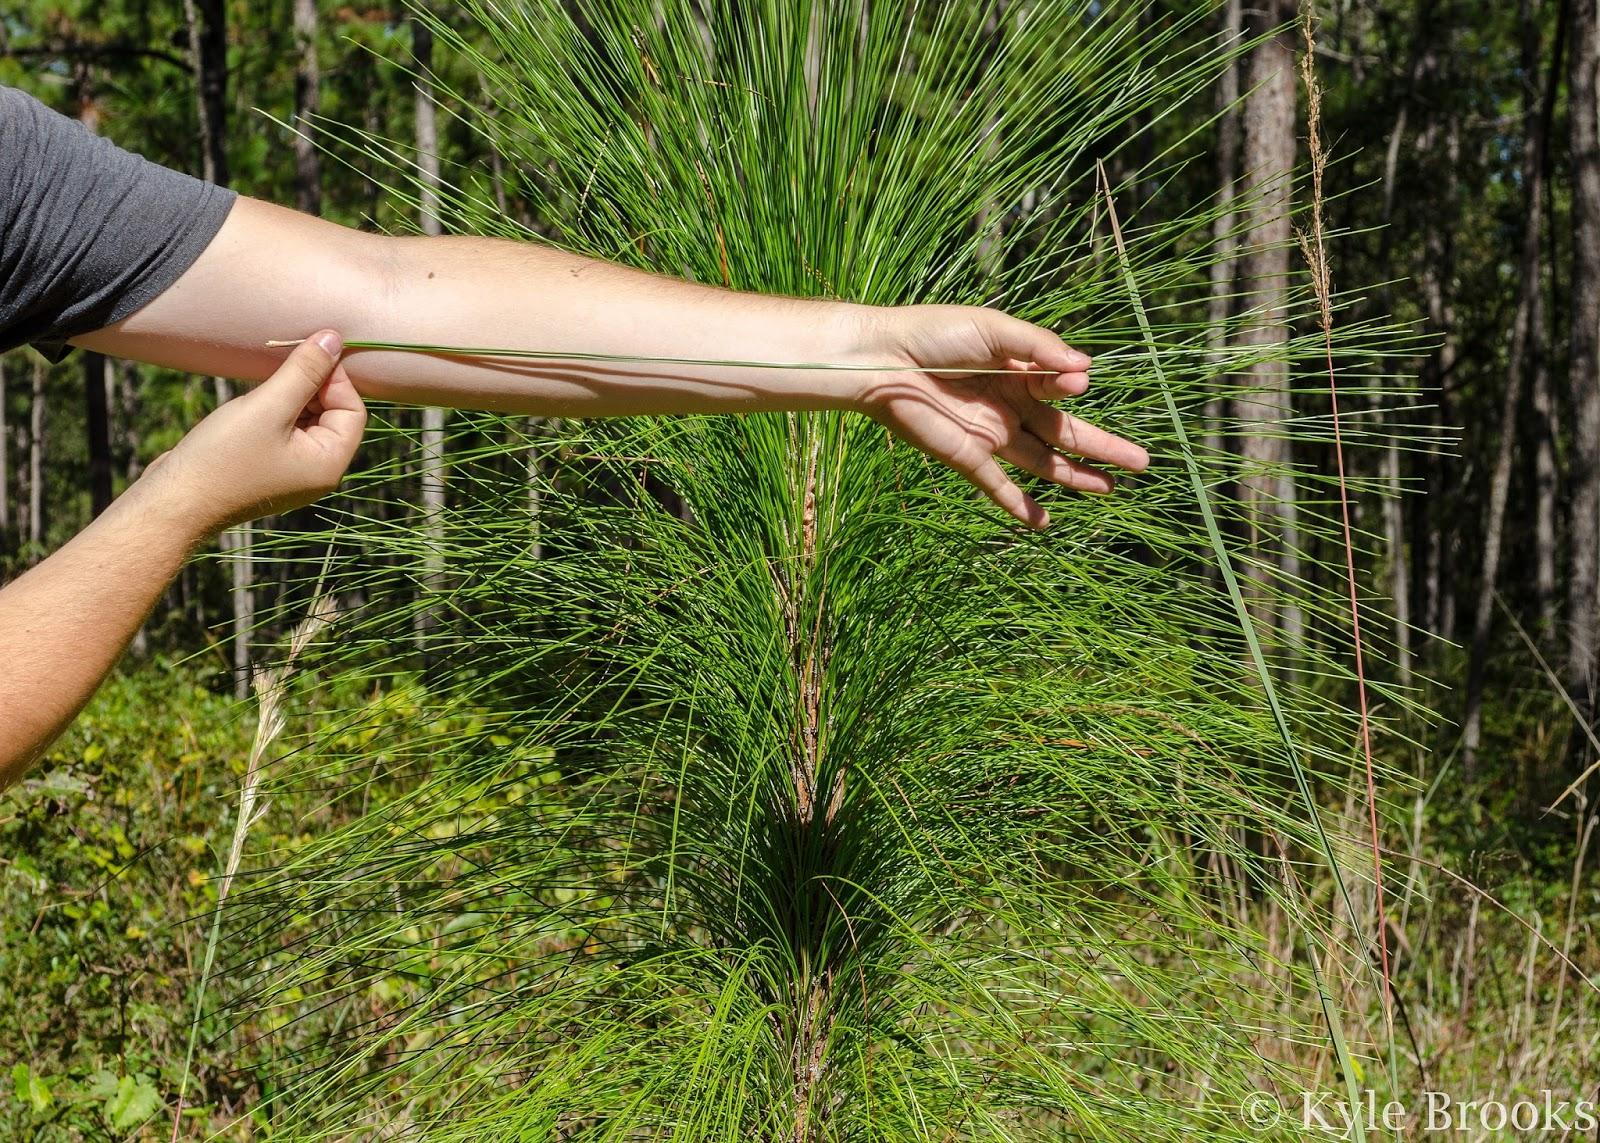 Longleaf Pine needle length